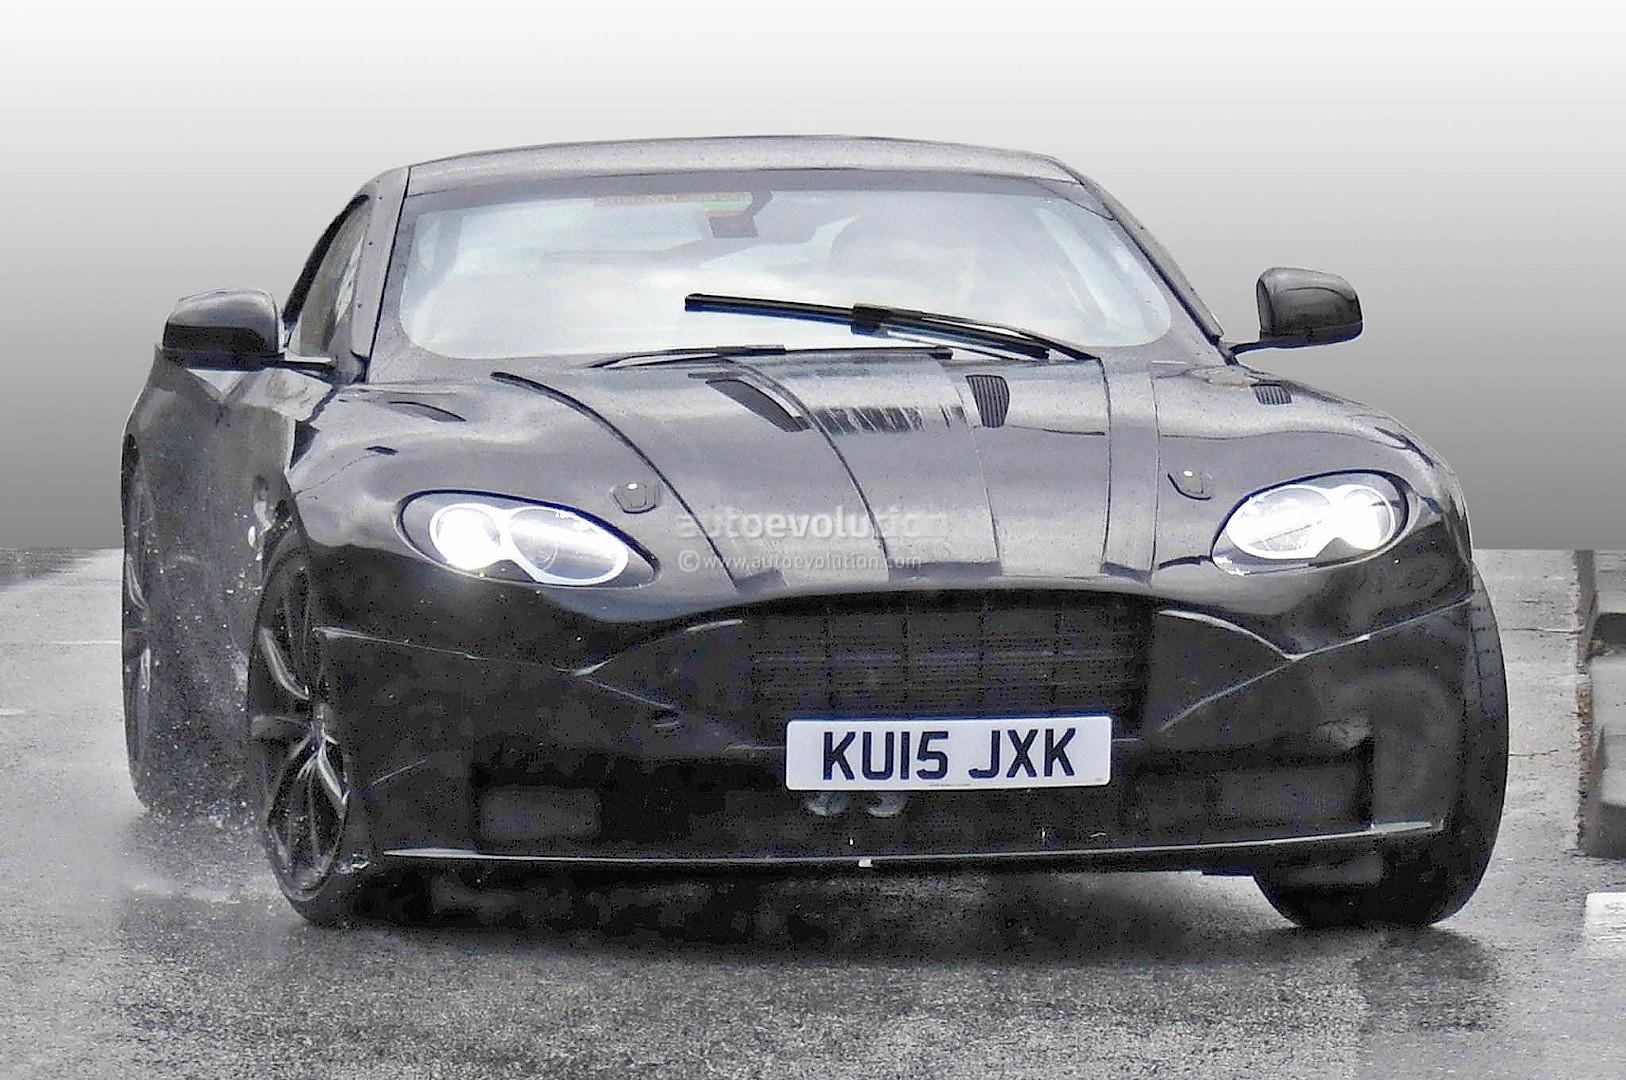 2016 - [Aston Martin] DB11 2017-aston-martin-db9-successor-prototype-spyshots-show-db10-like-silhouette-digital-dashboard-intercoolers_9